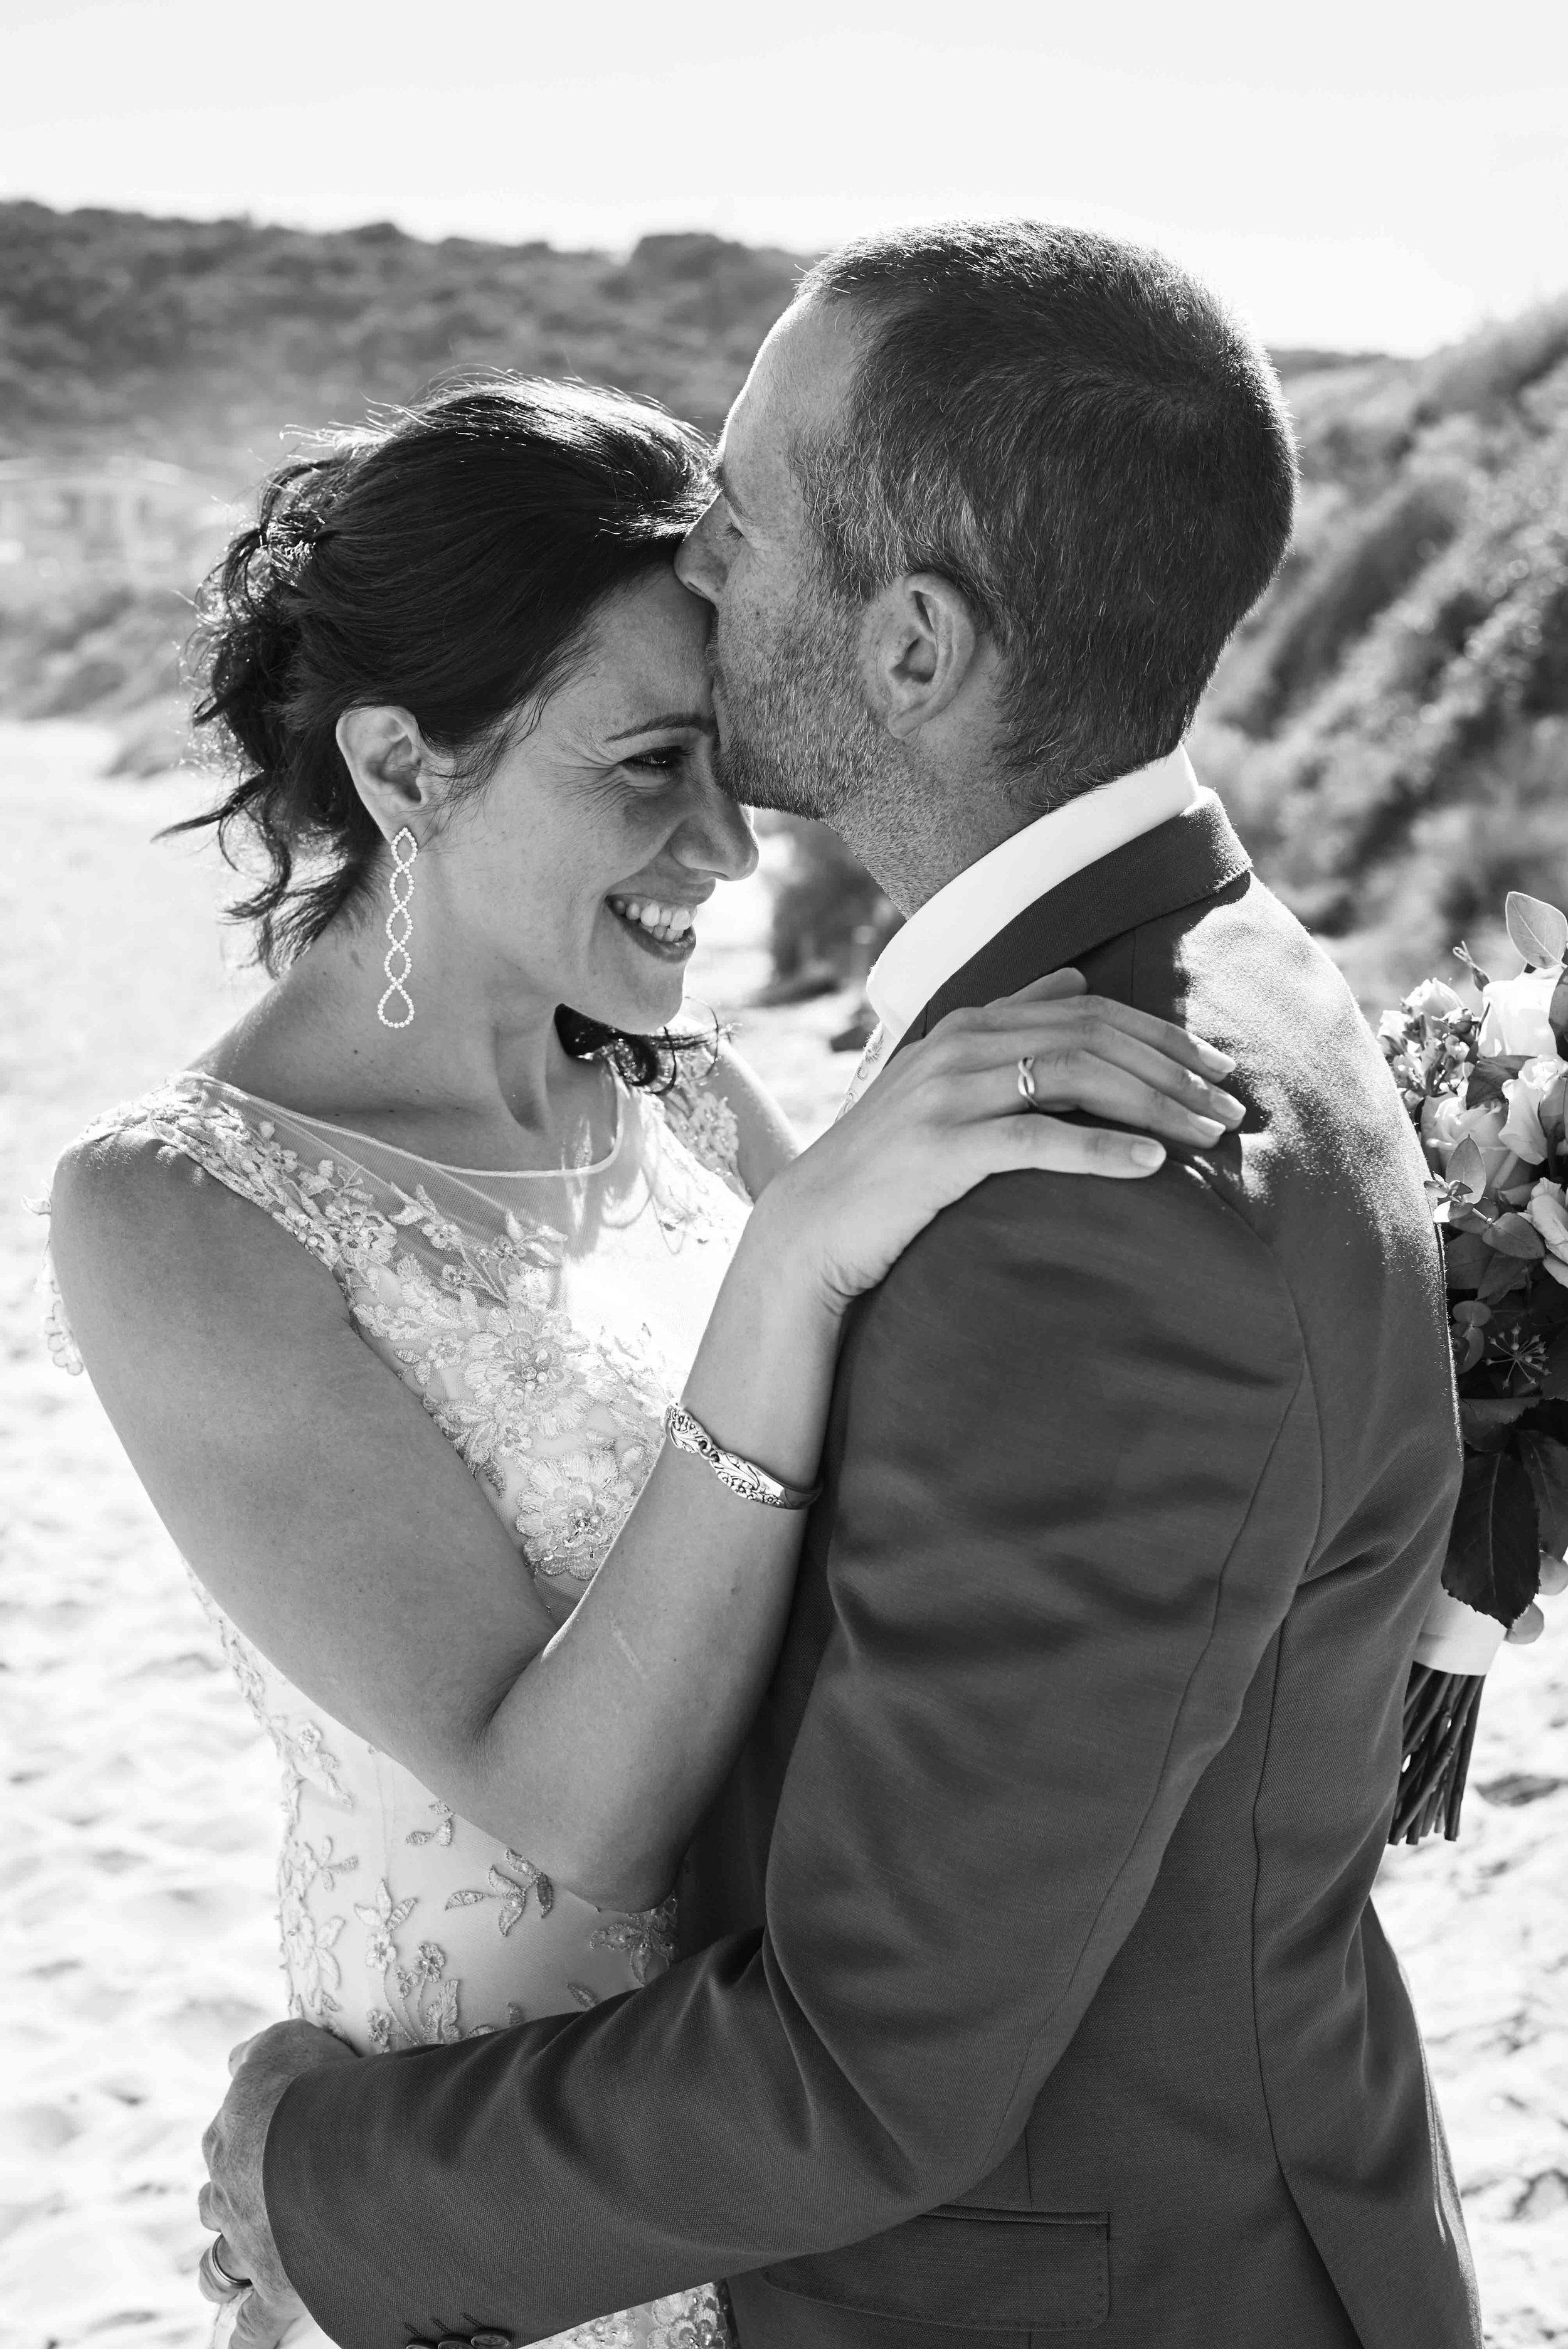 sorrento-wedding-photography-all-smiles-marissa-jade-photography-115.jpg